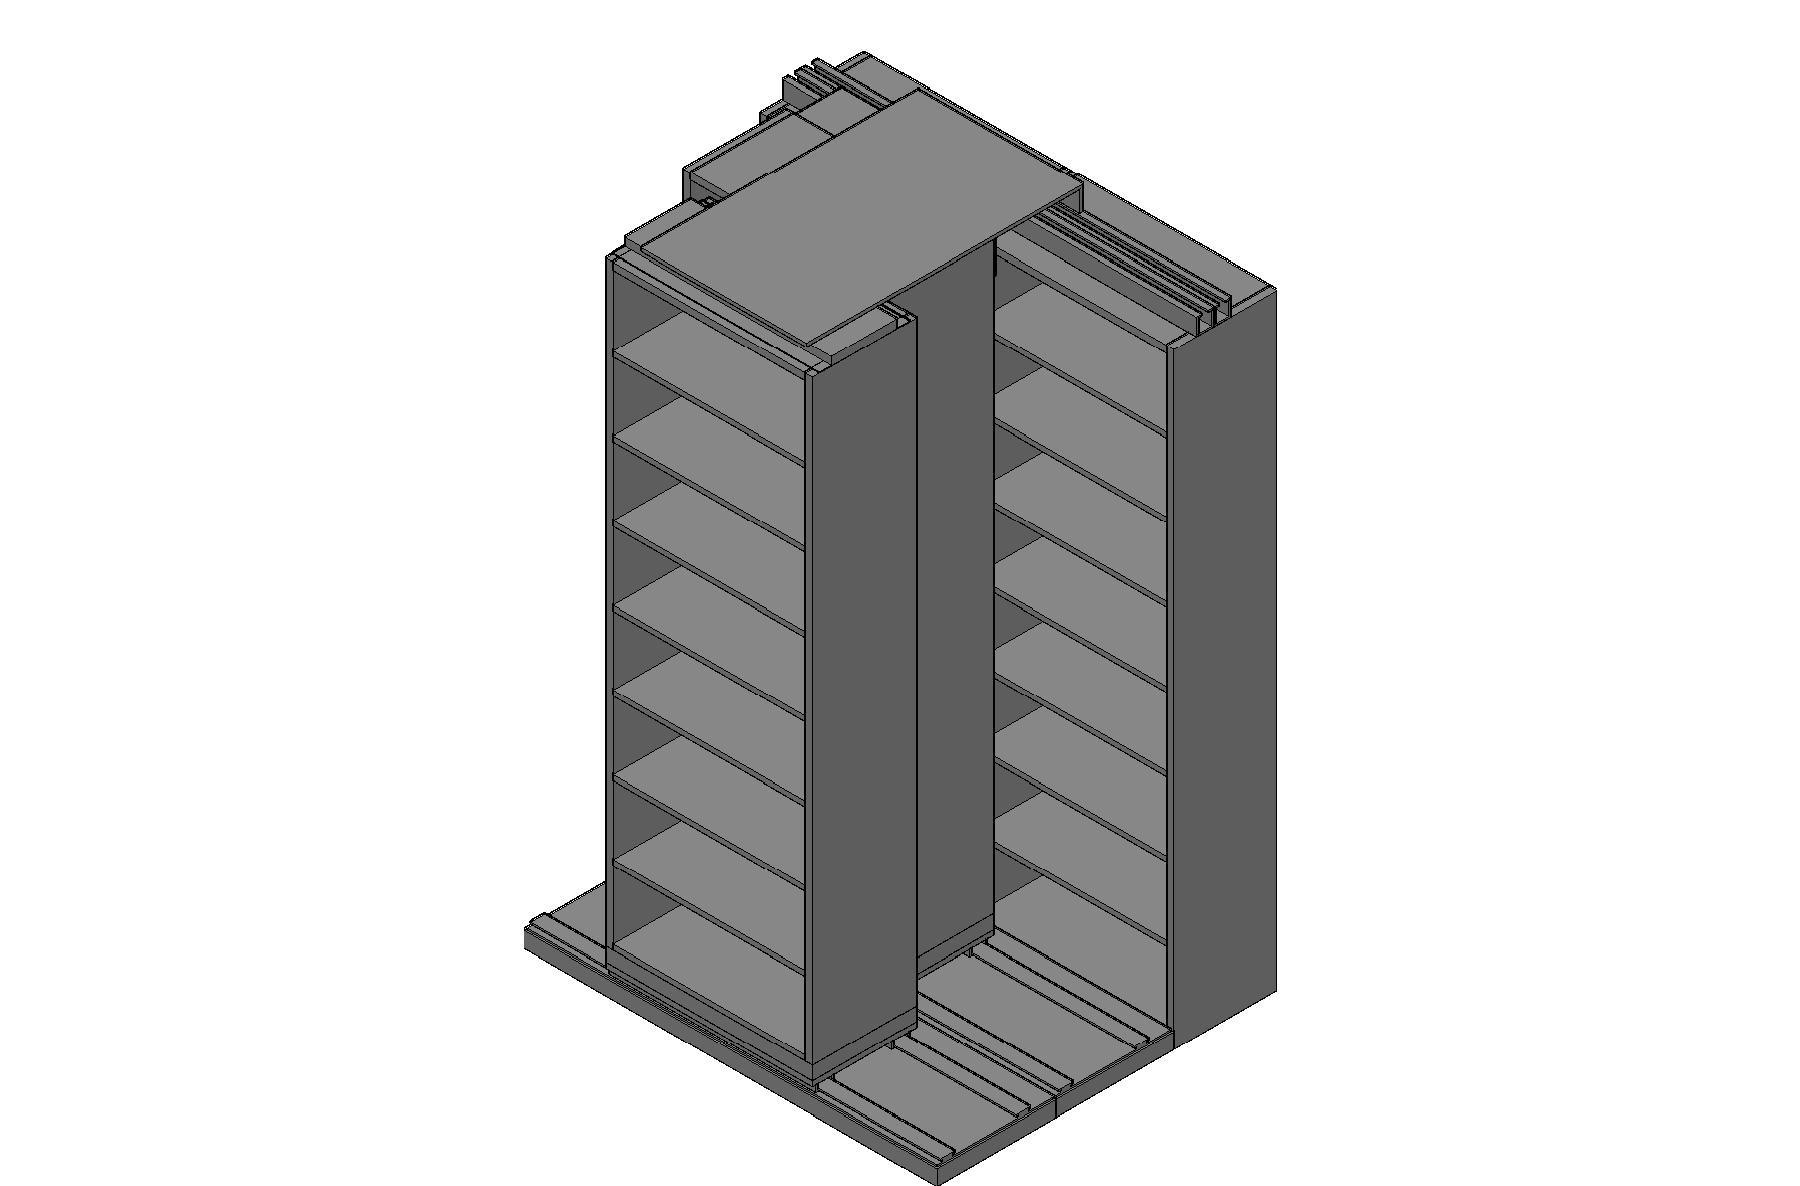 "Legal Size Sliding Shelves - 3 Rows Deep - 8 Levels - (30"" x 15"" Shelves) - 64"" Total Width"